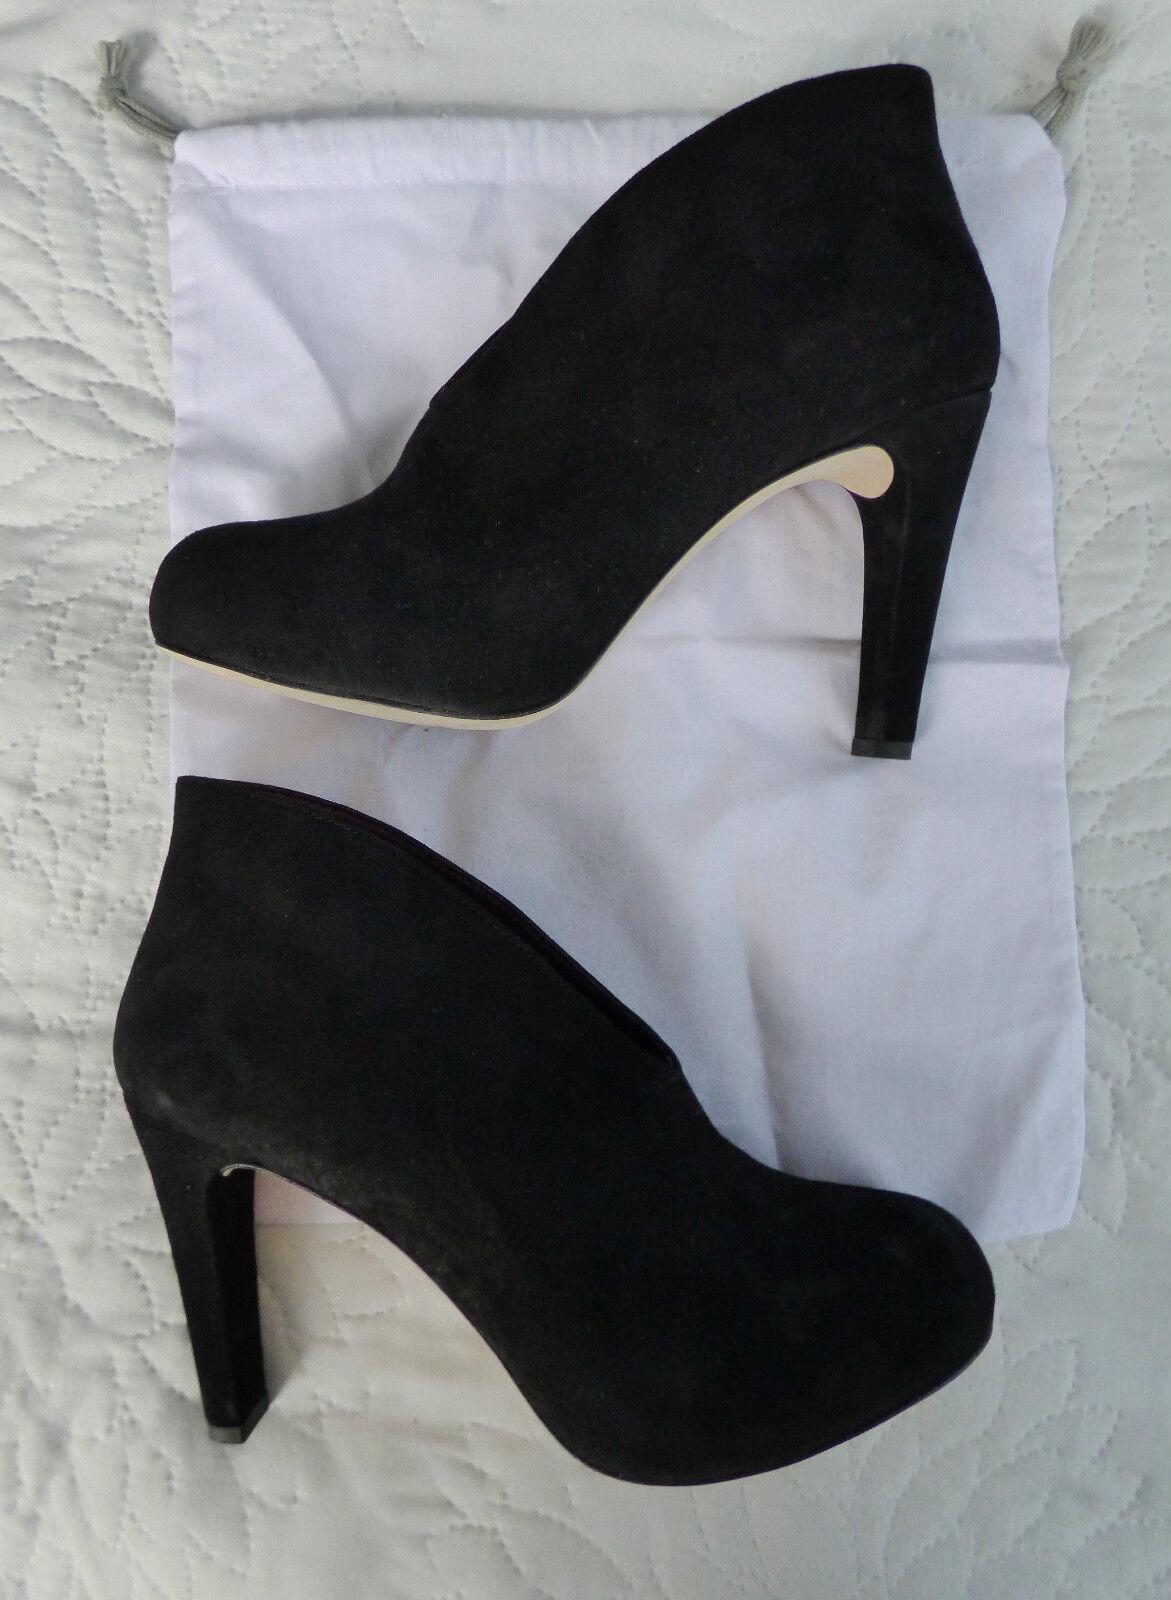 Escarpins montants cuir noir Gérard Darel - Taille 41